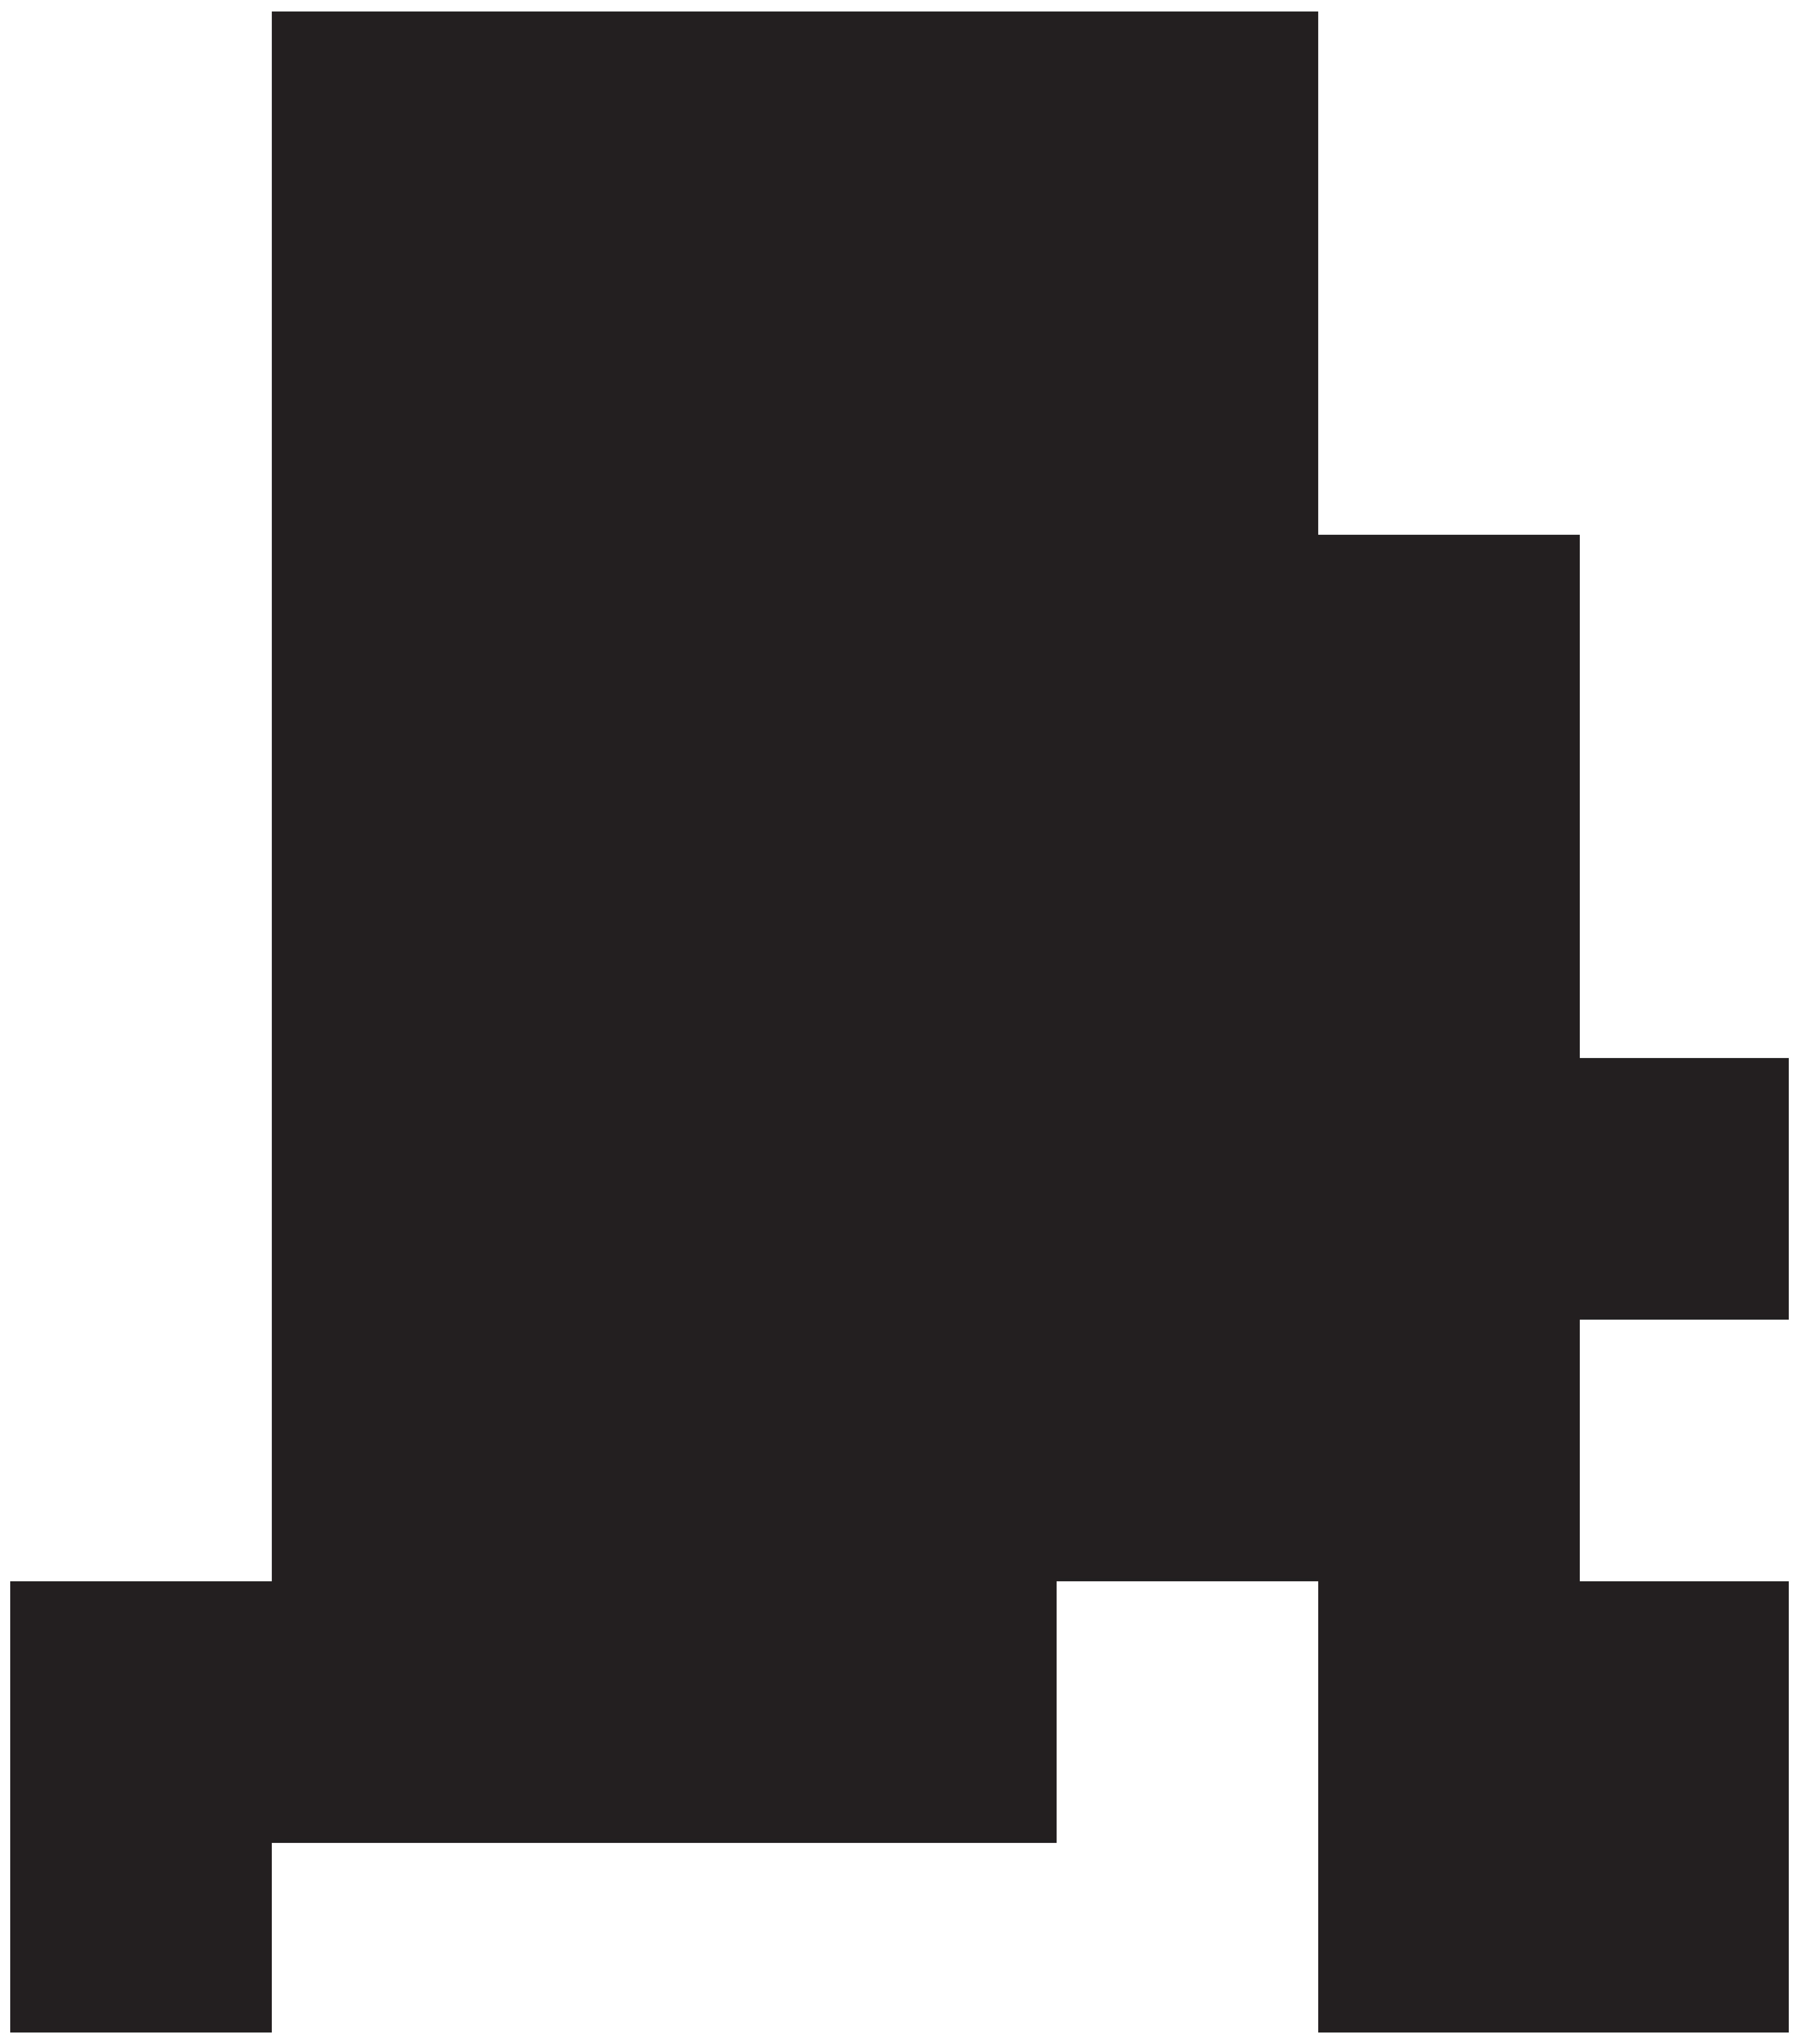 Clip art Baseball player Batting Batter.